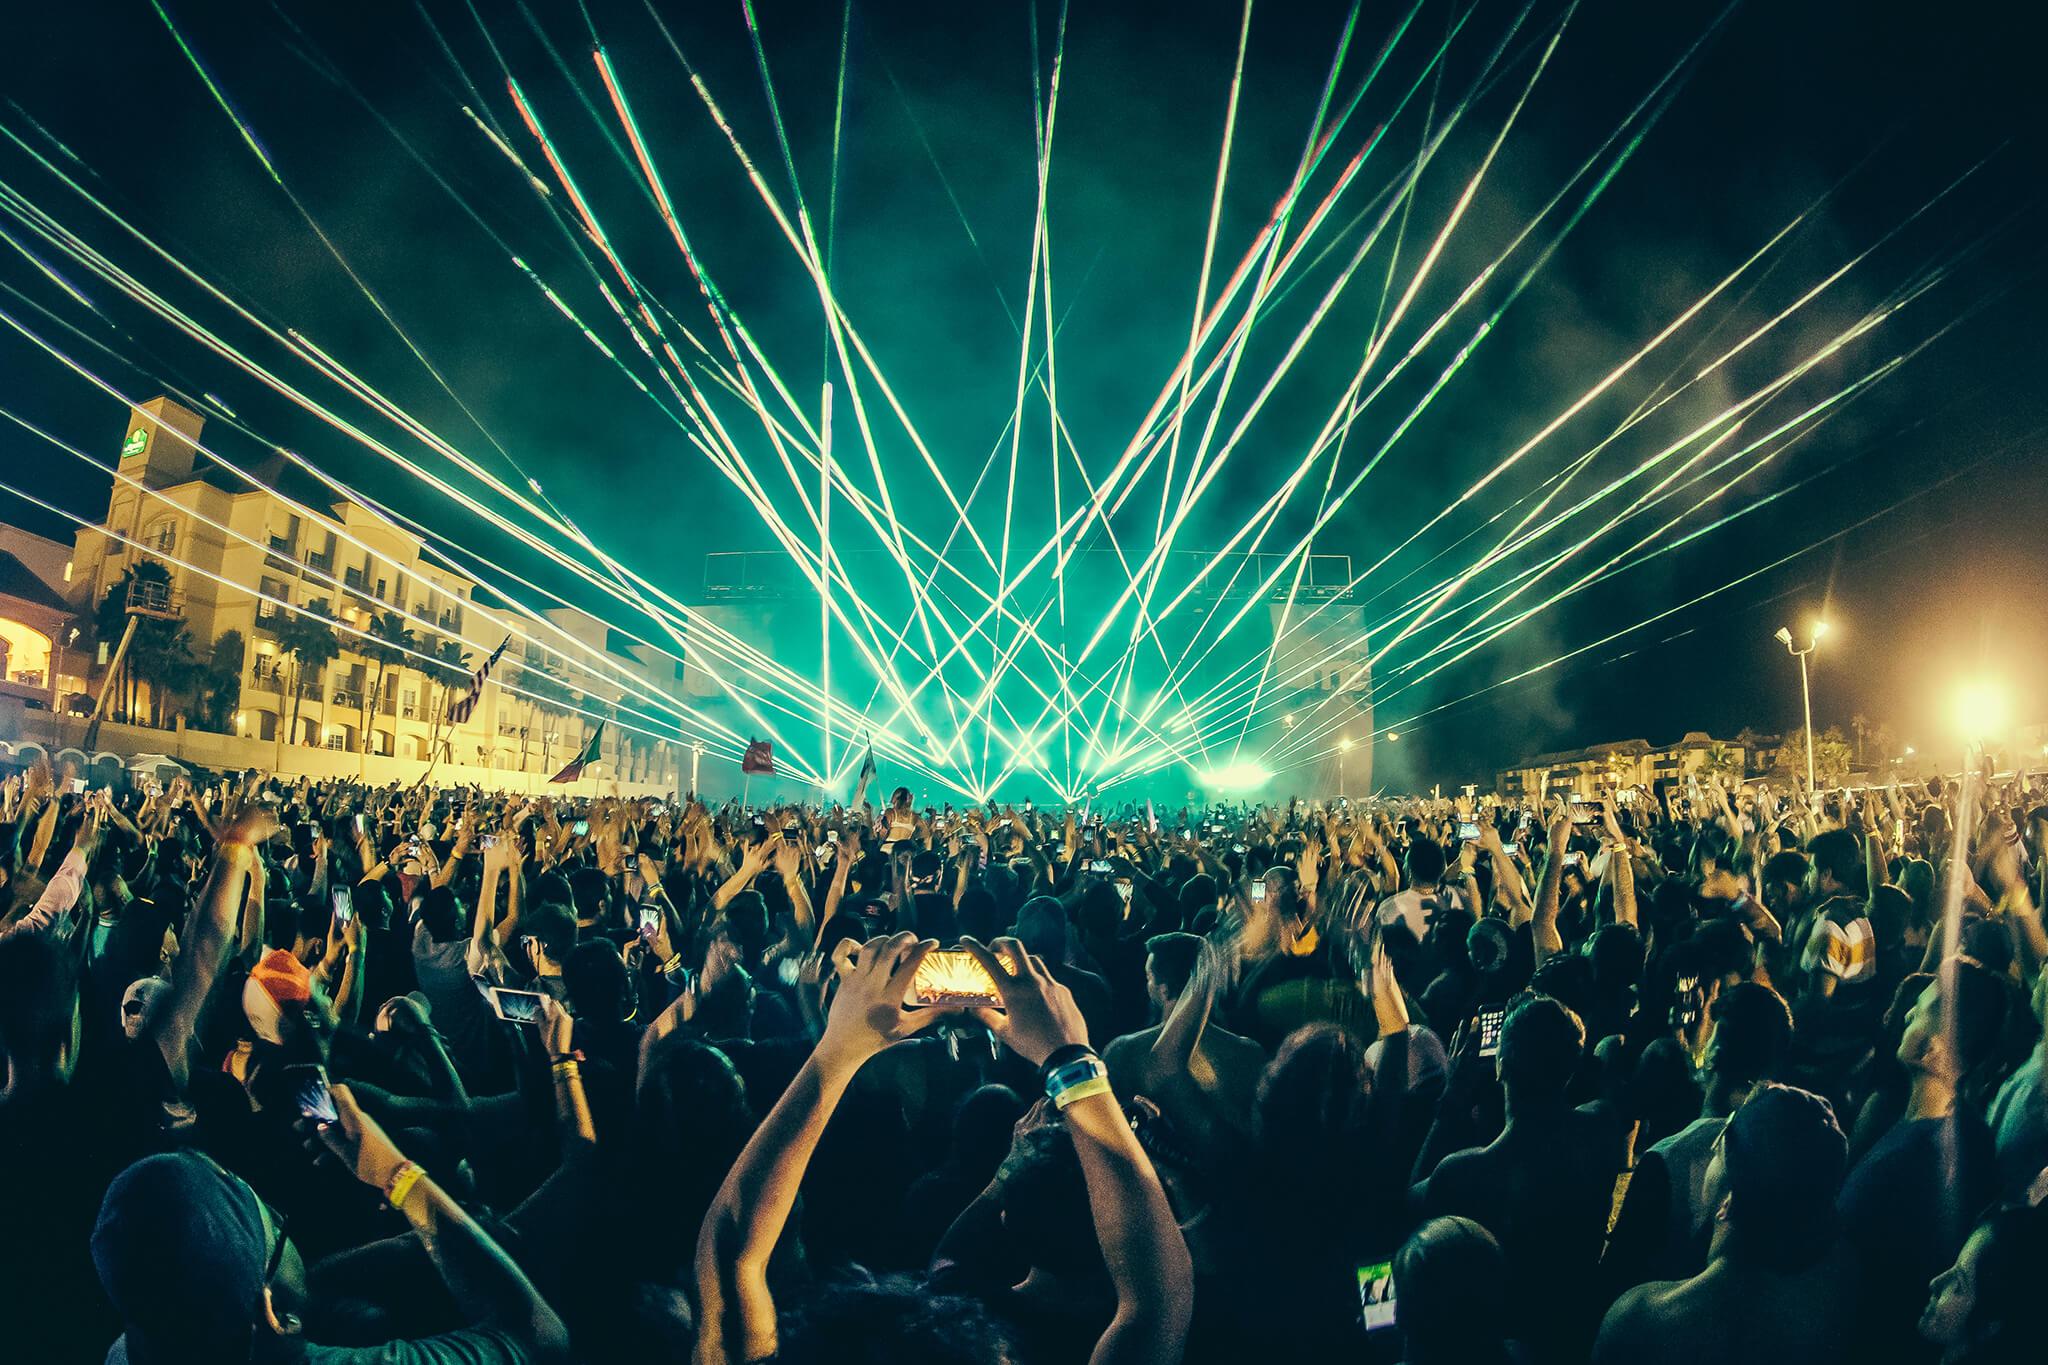 lasers during zedd at ume